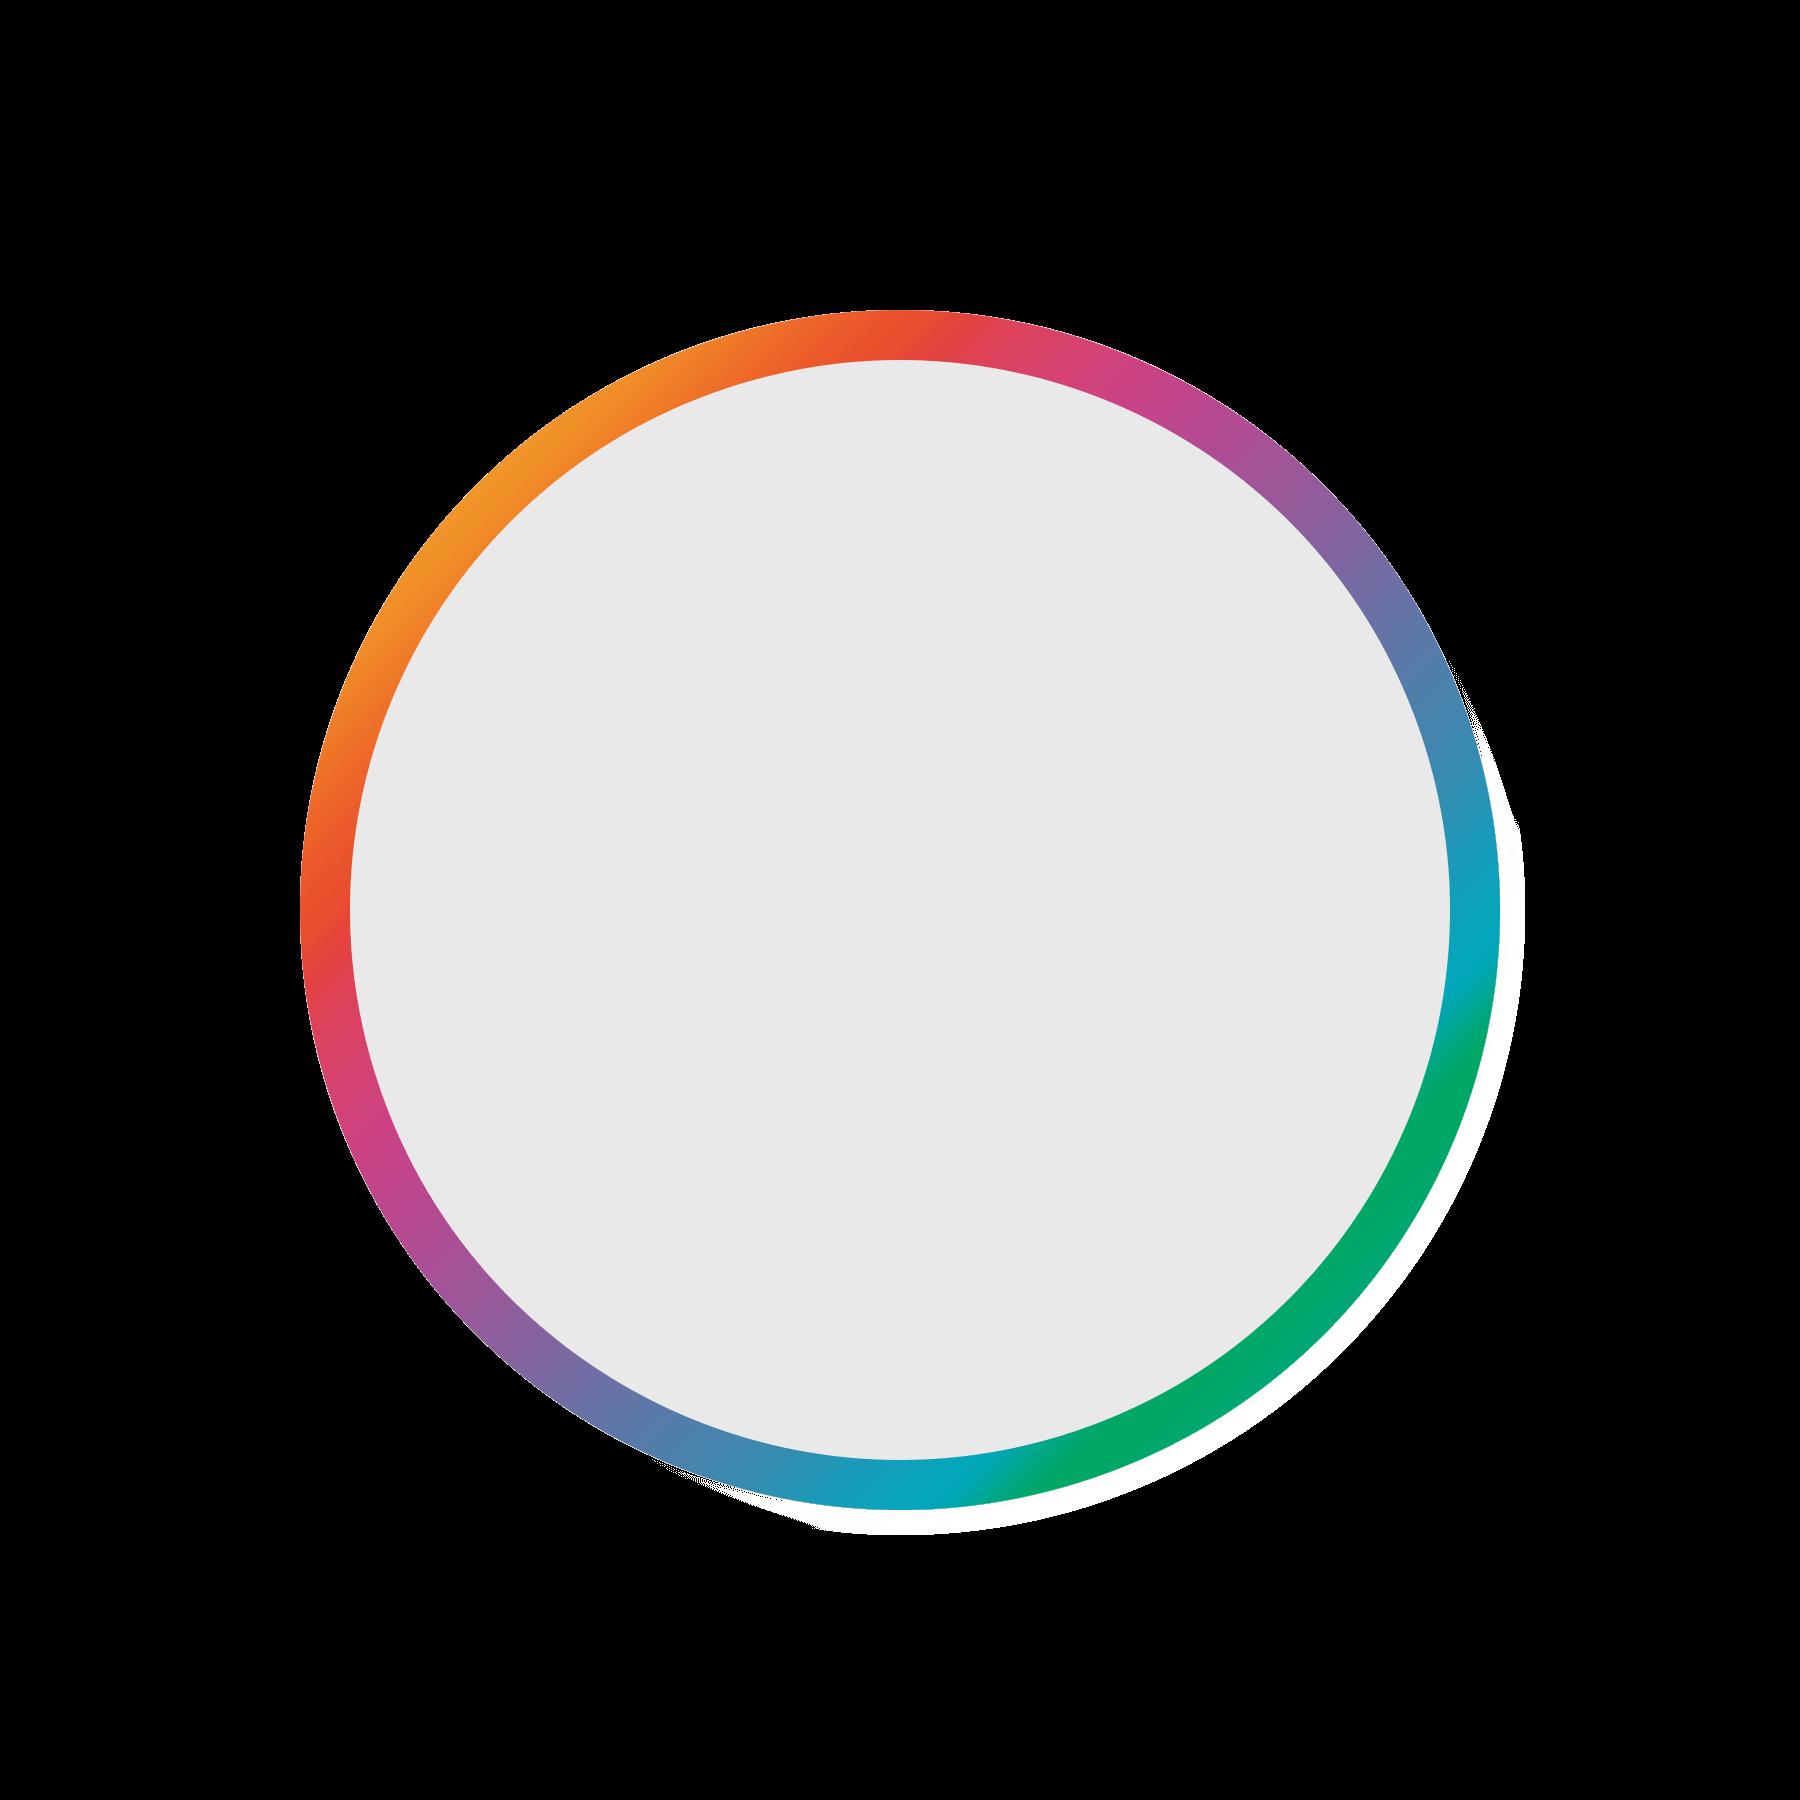 XMG SECTOR - AMD